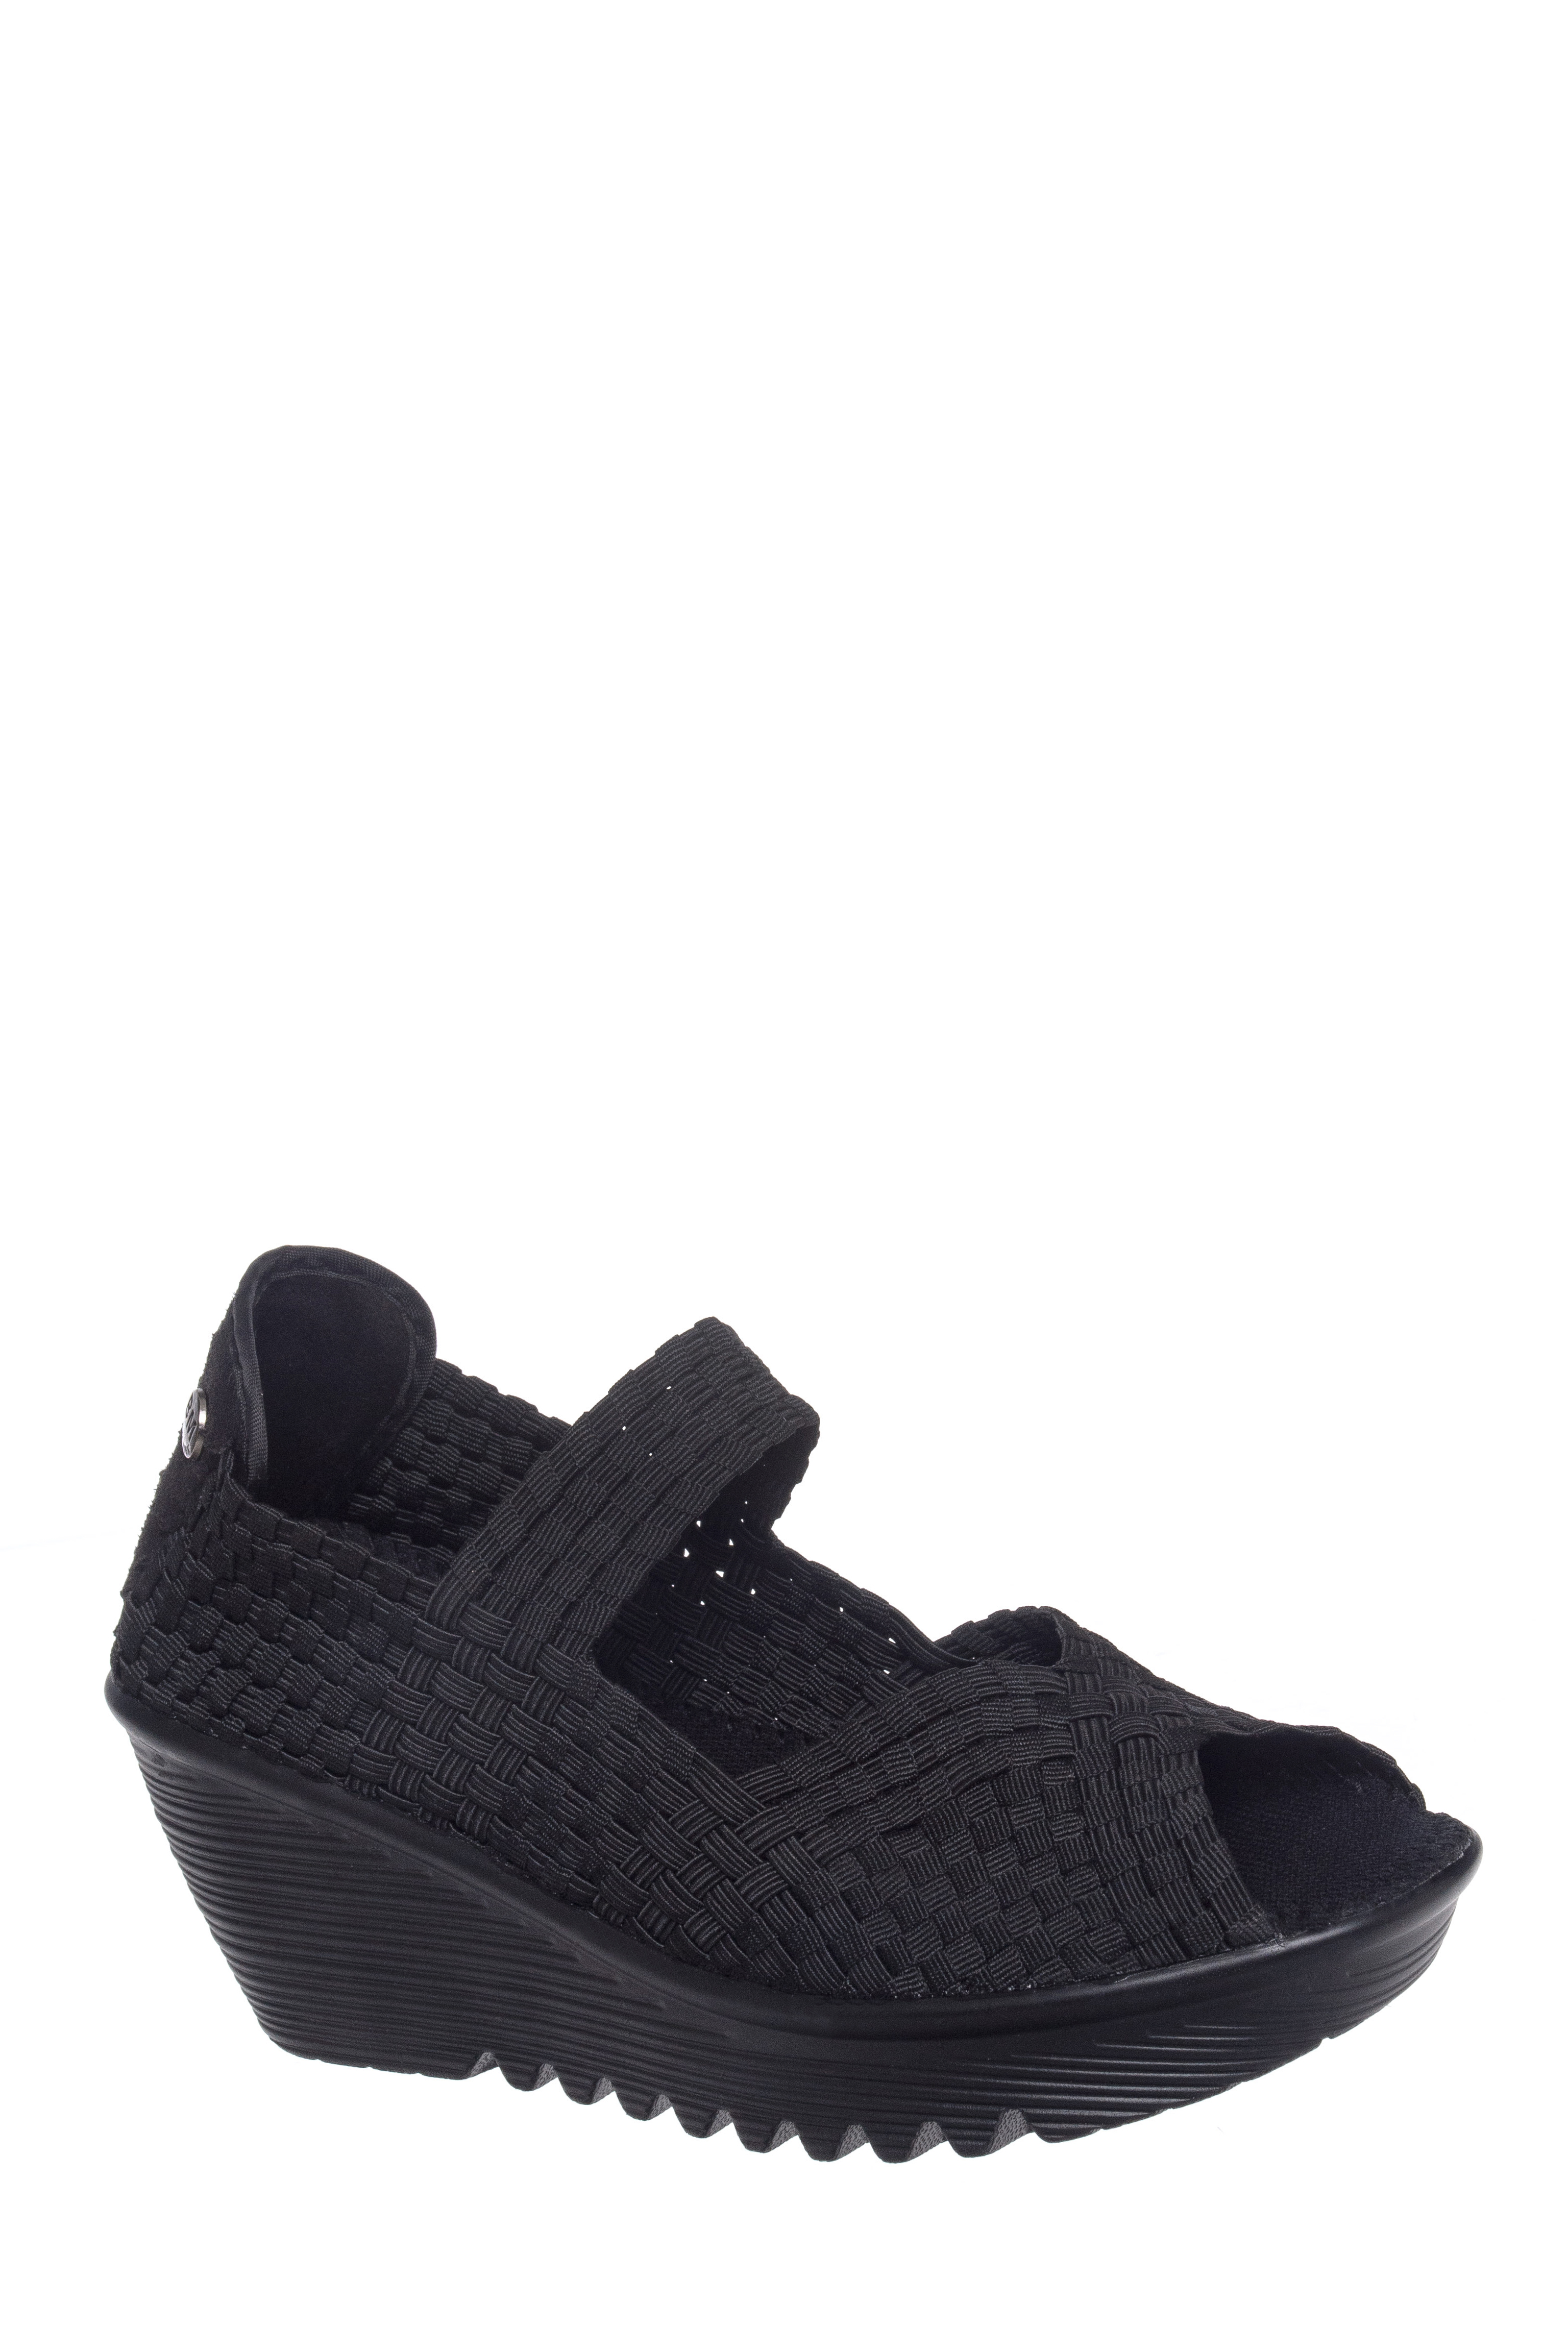 BERNIE MEV Hallie Mid Wedge Peep Toe Sandals - Black